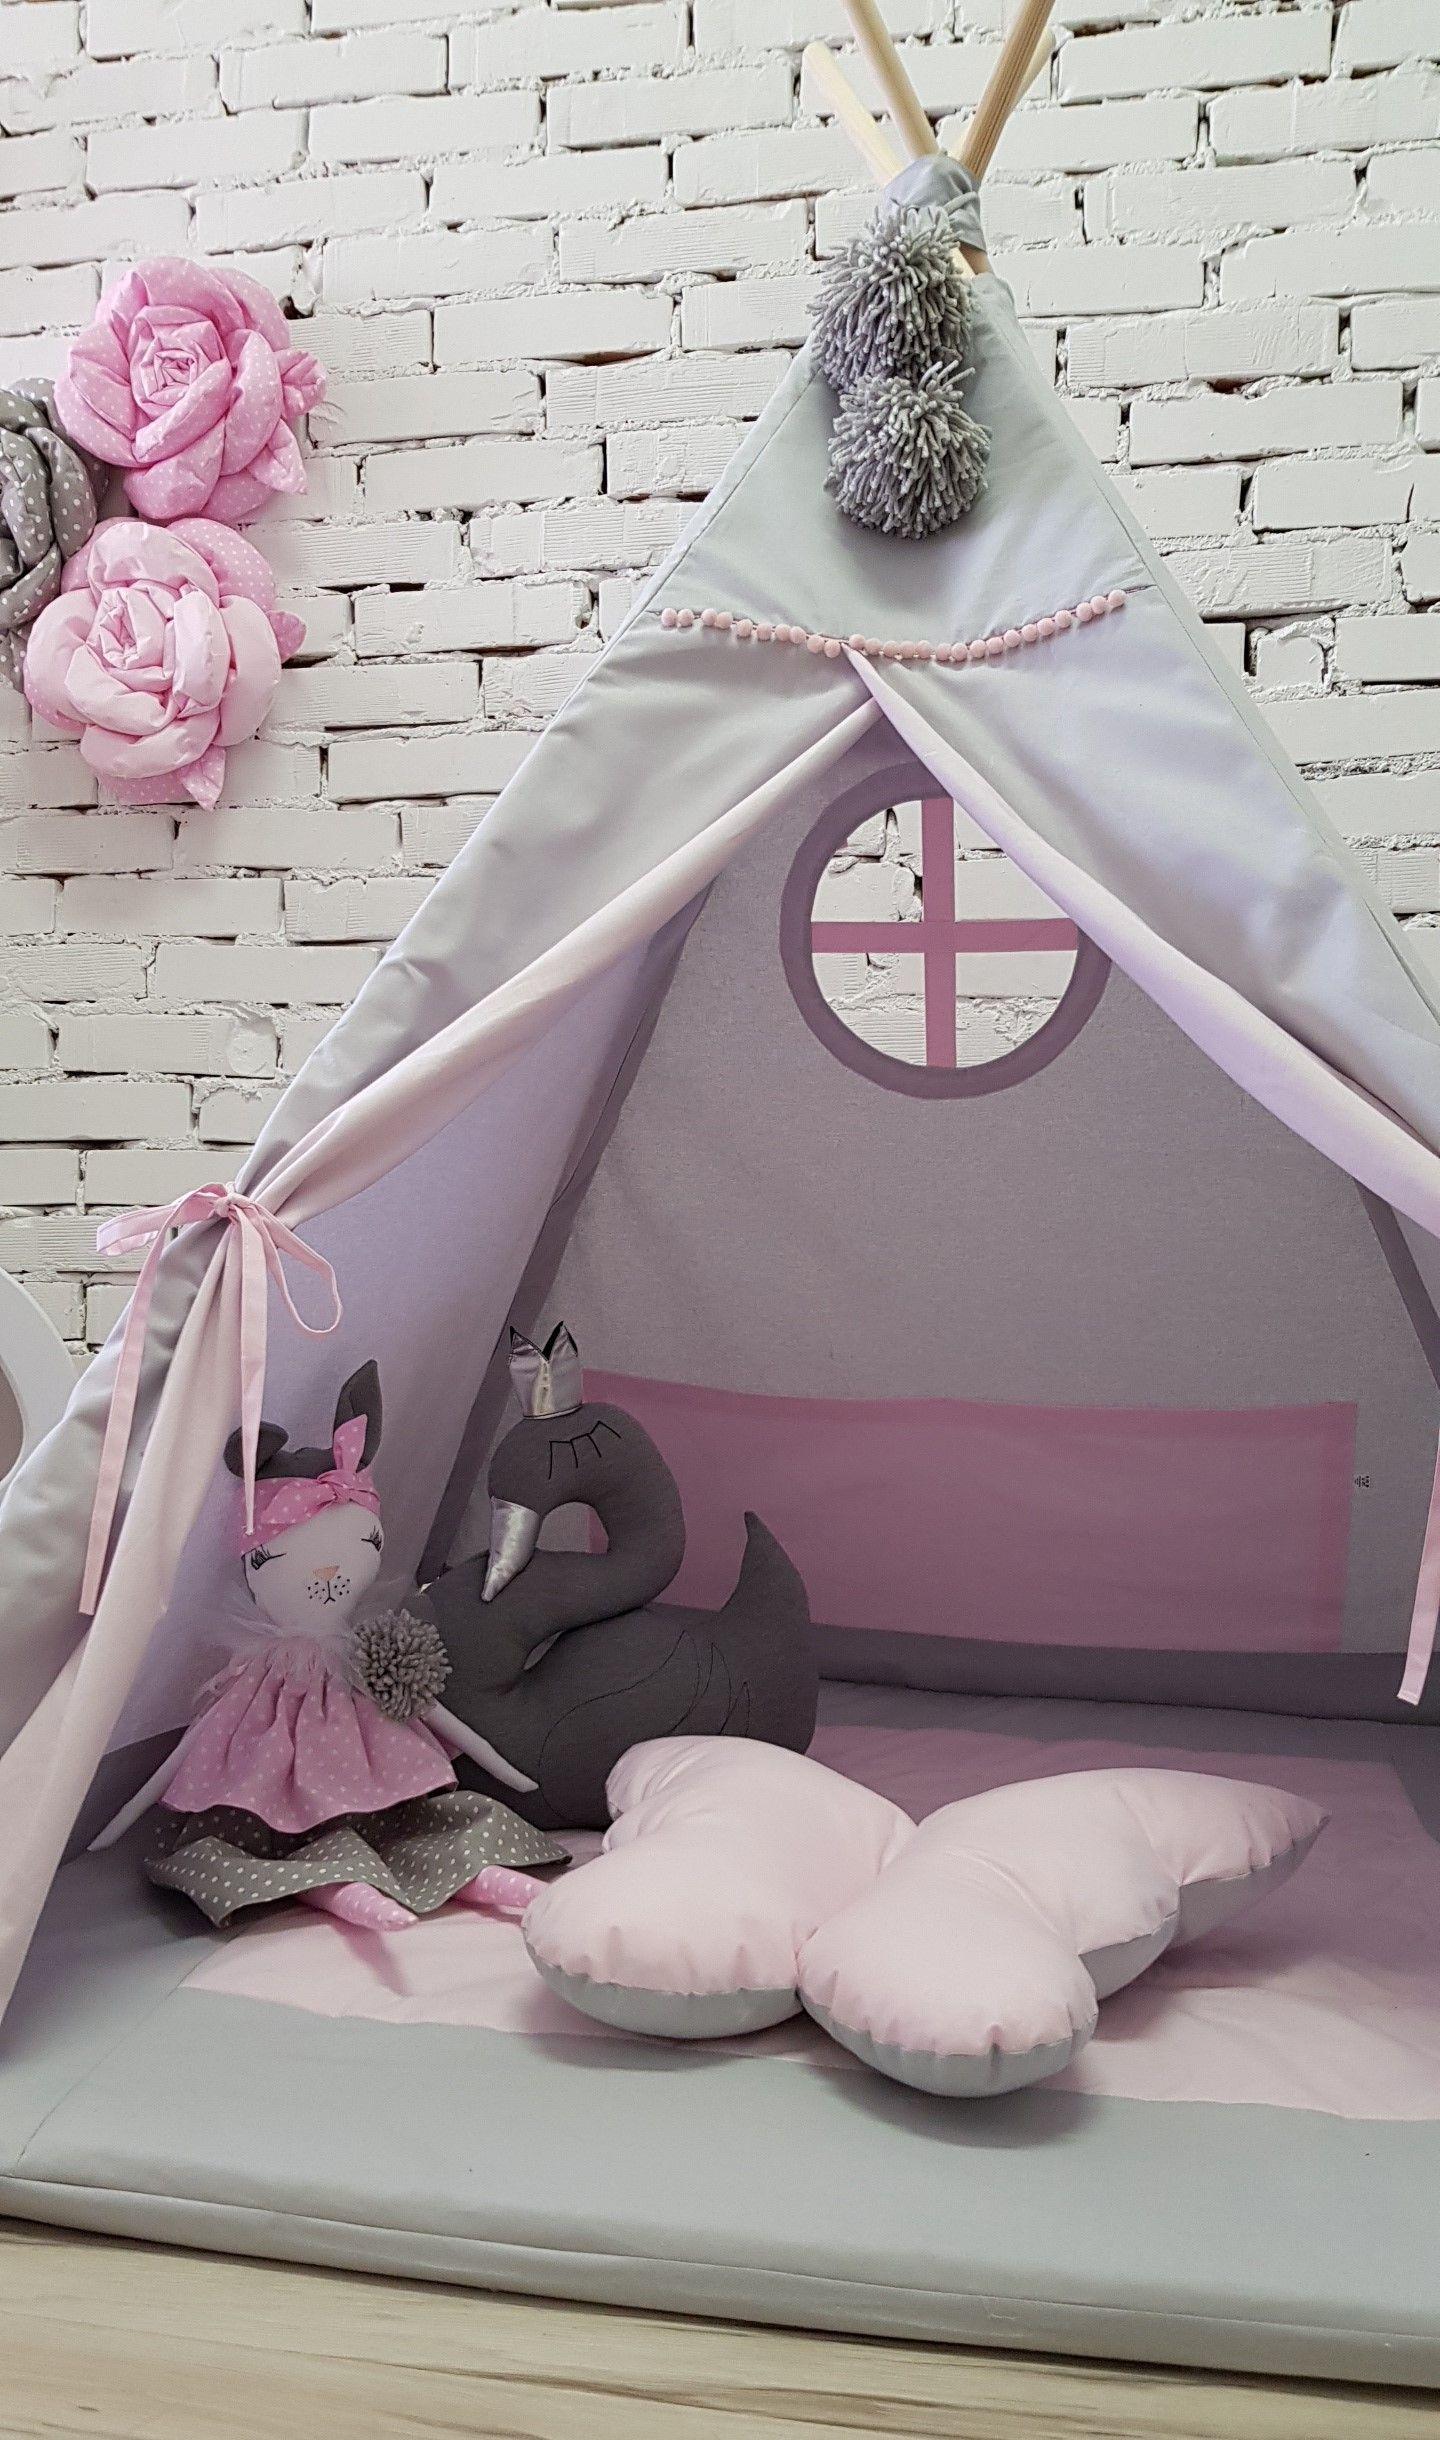 Namiot Dla Dzieci Tipi Mata Poduszki Bajkowe 7883467654 Oficjalne Archiwum Allegro Baby Mobile Home Decor Decor